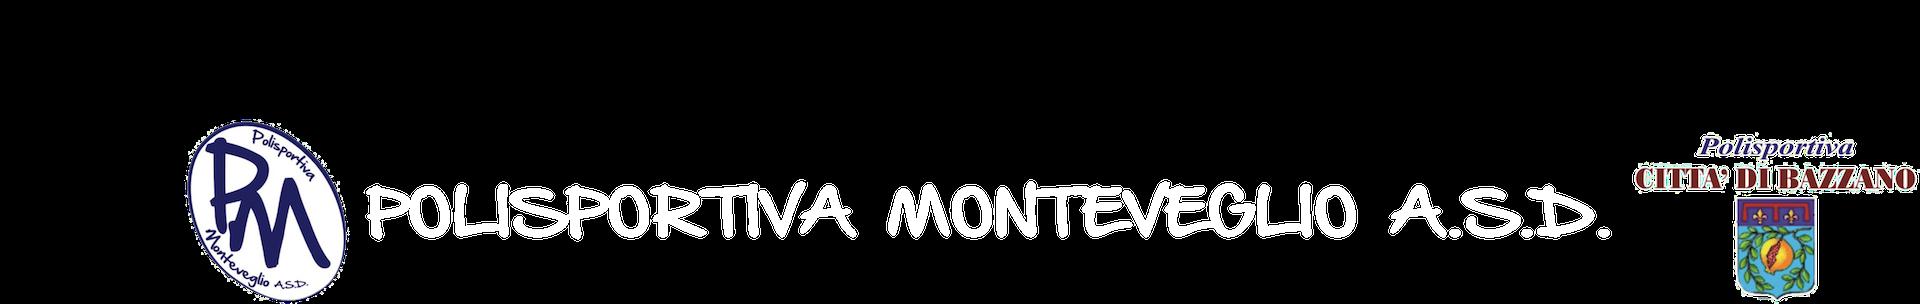 nuovo logo 3